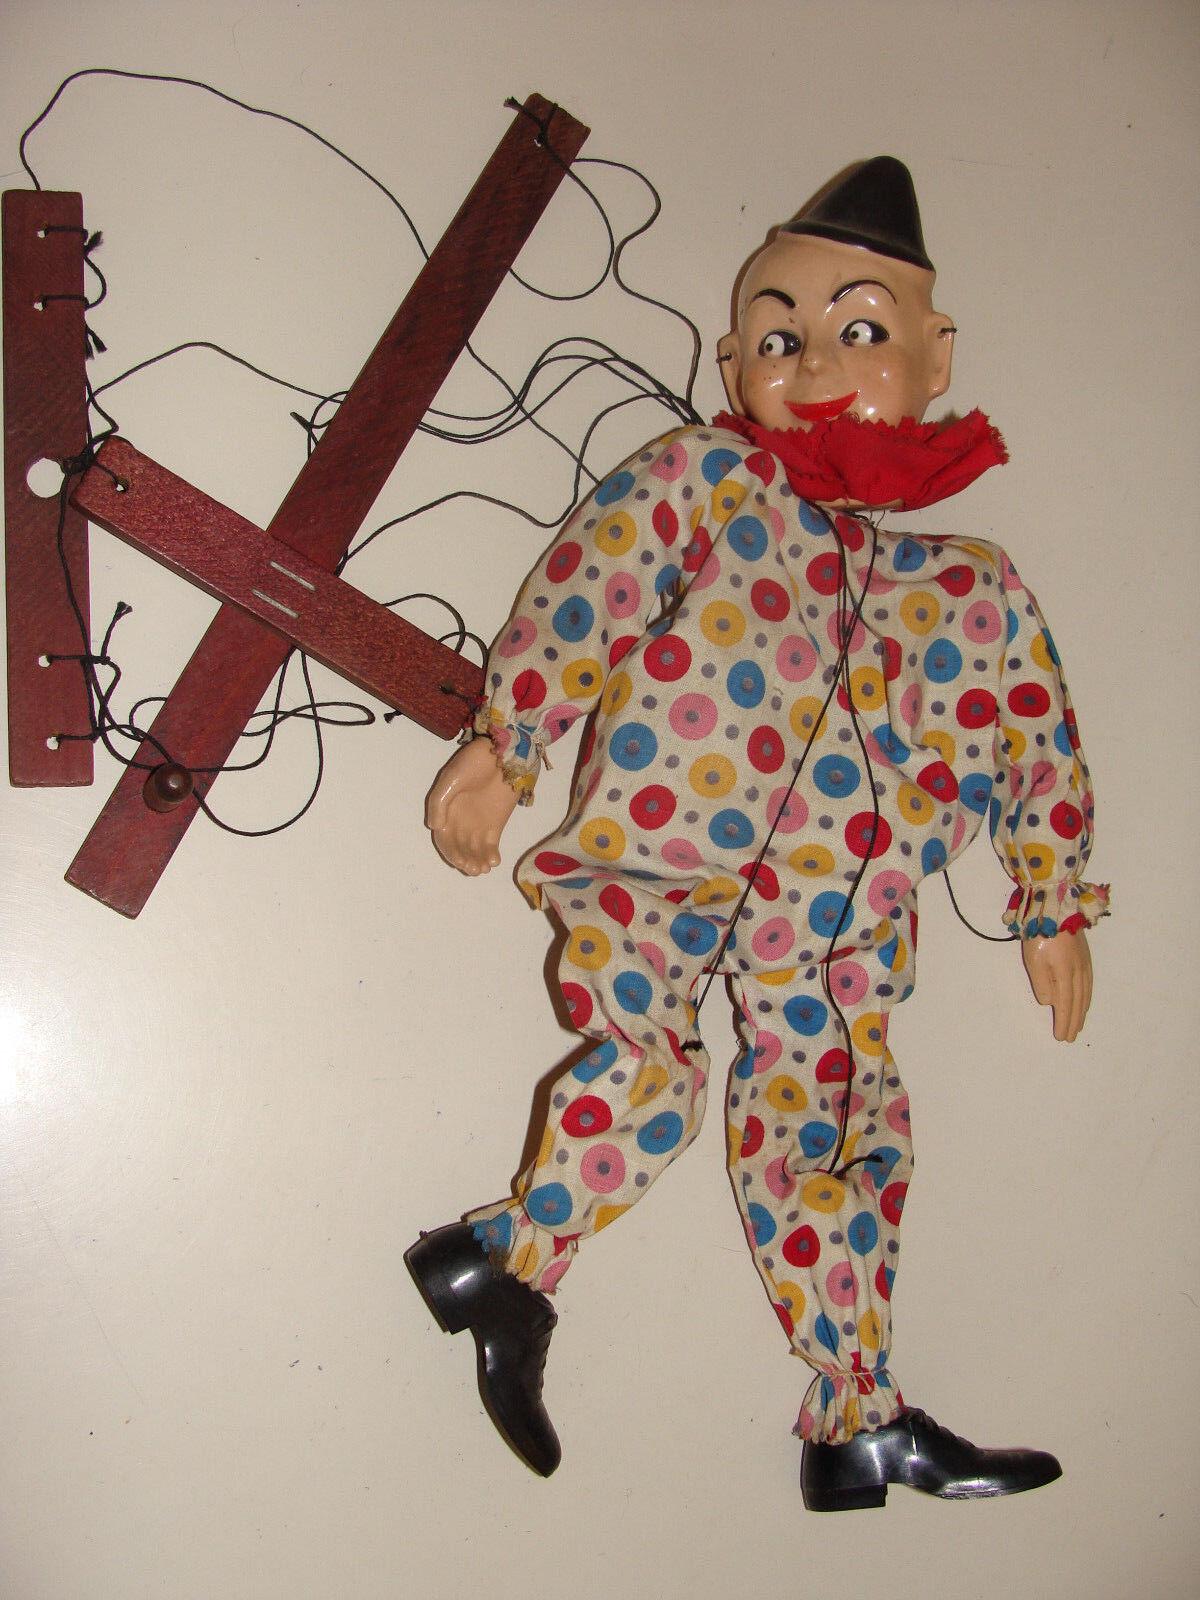 Vintage Clown Marionette Puppet Hazelle Airplane Control 1950s